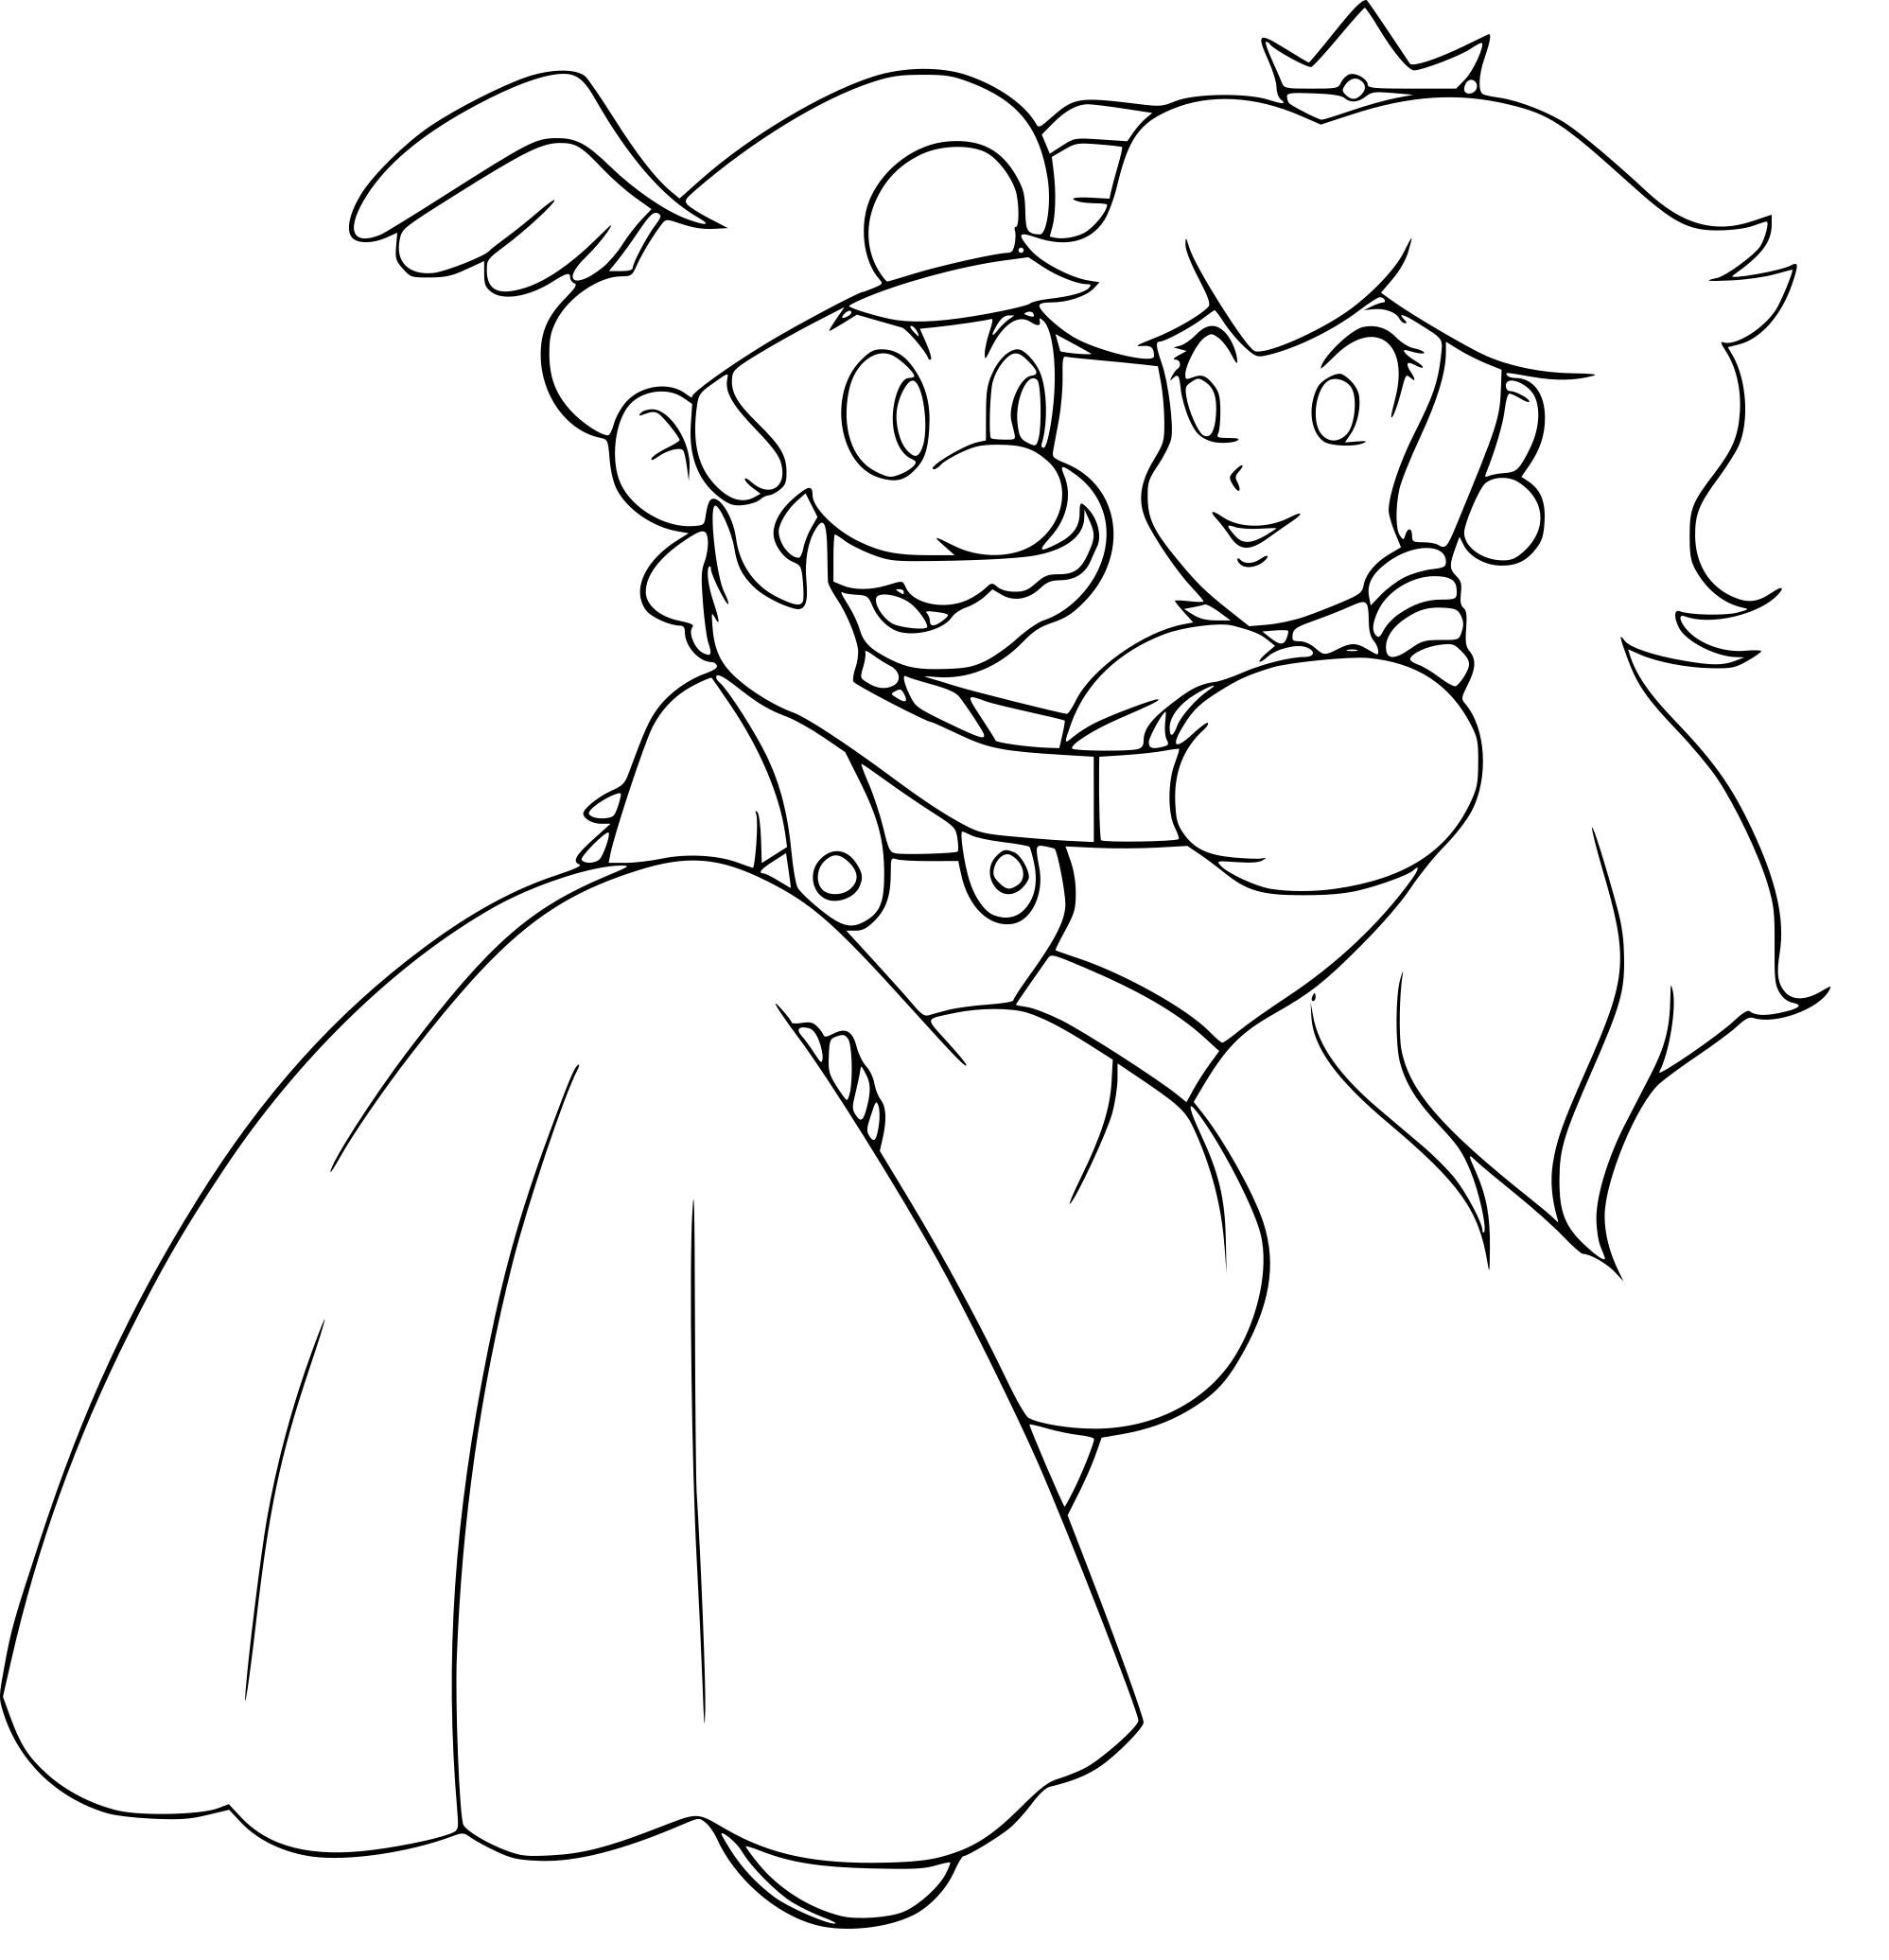 Coloriage Mario Et Peach A Imprimer